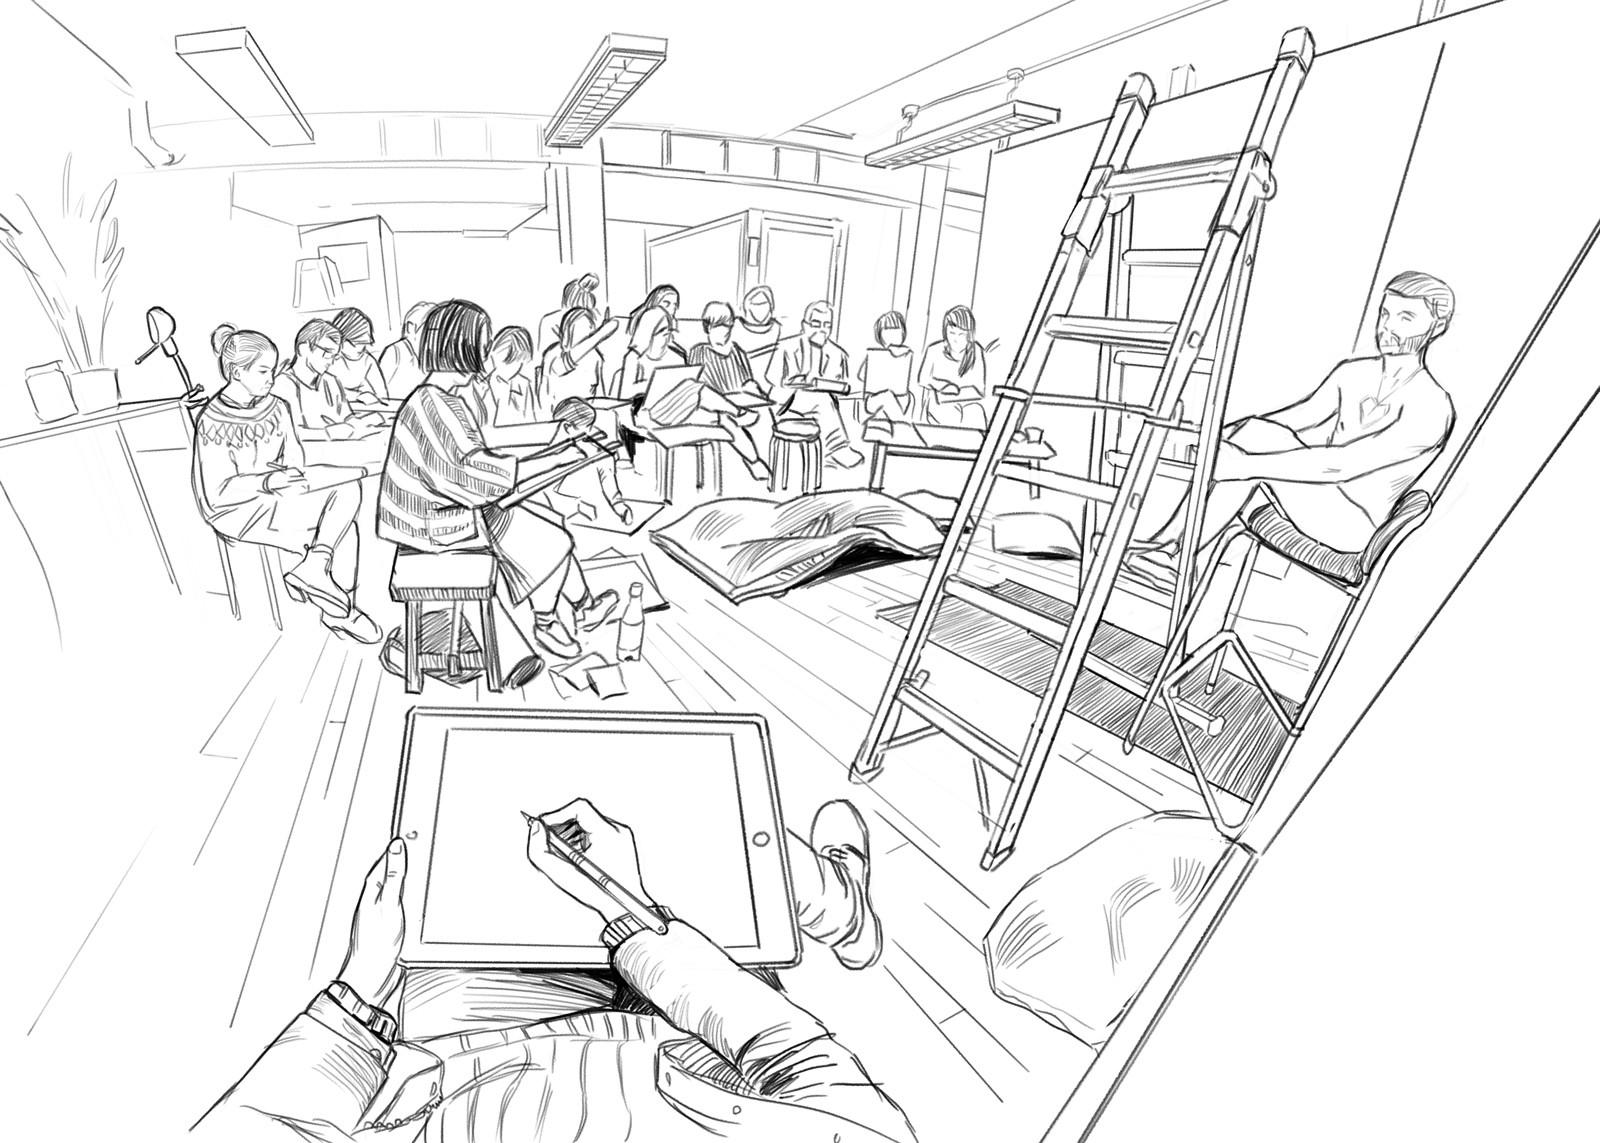 Joseph nickson life drawing